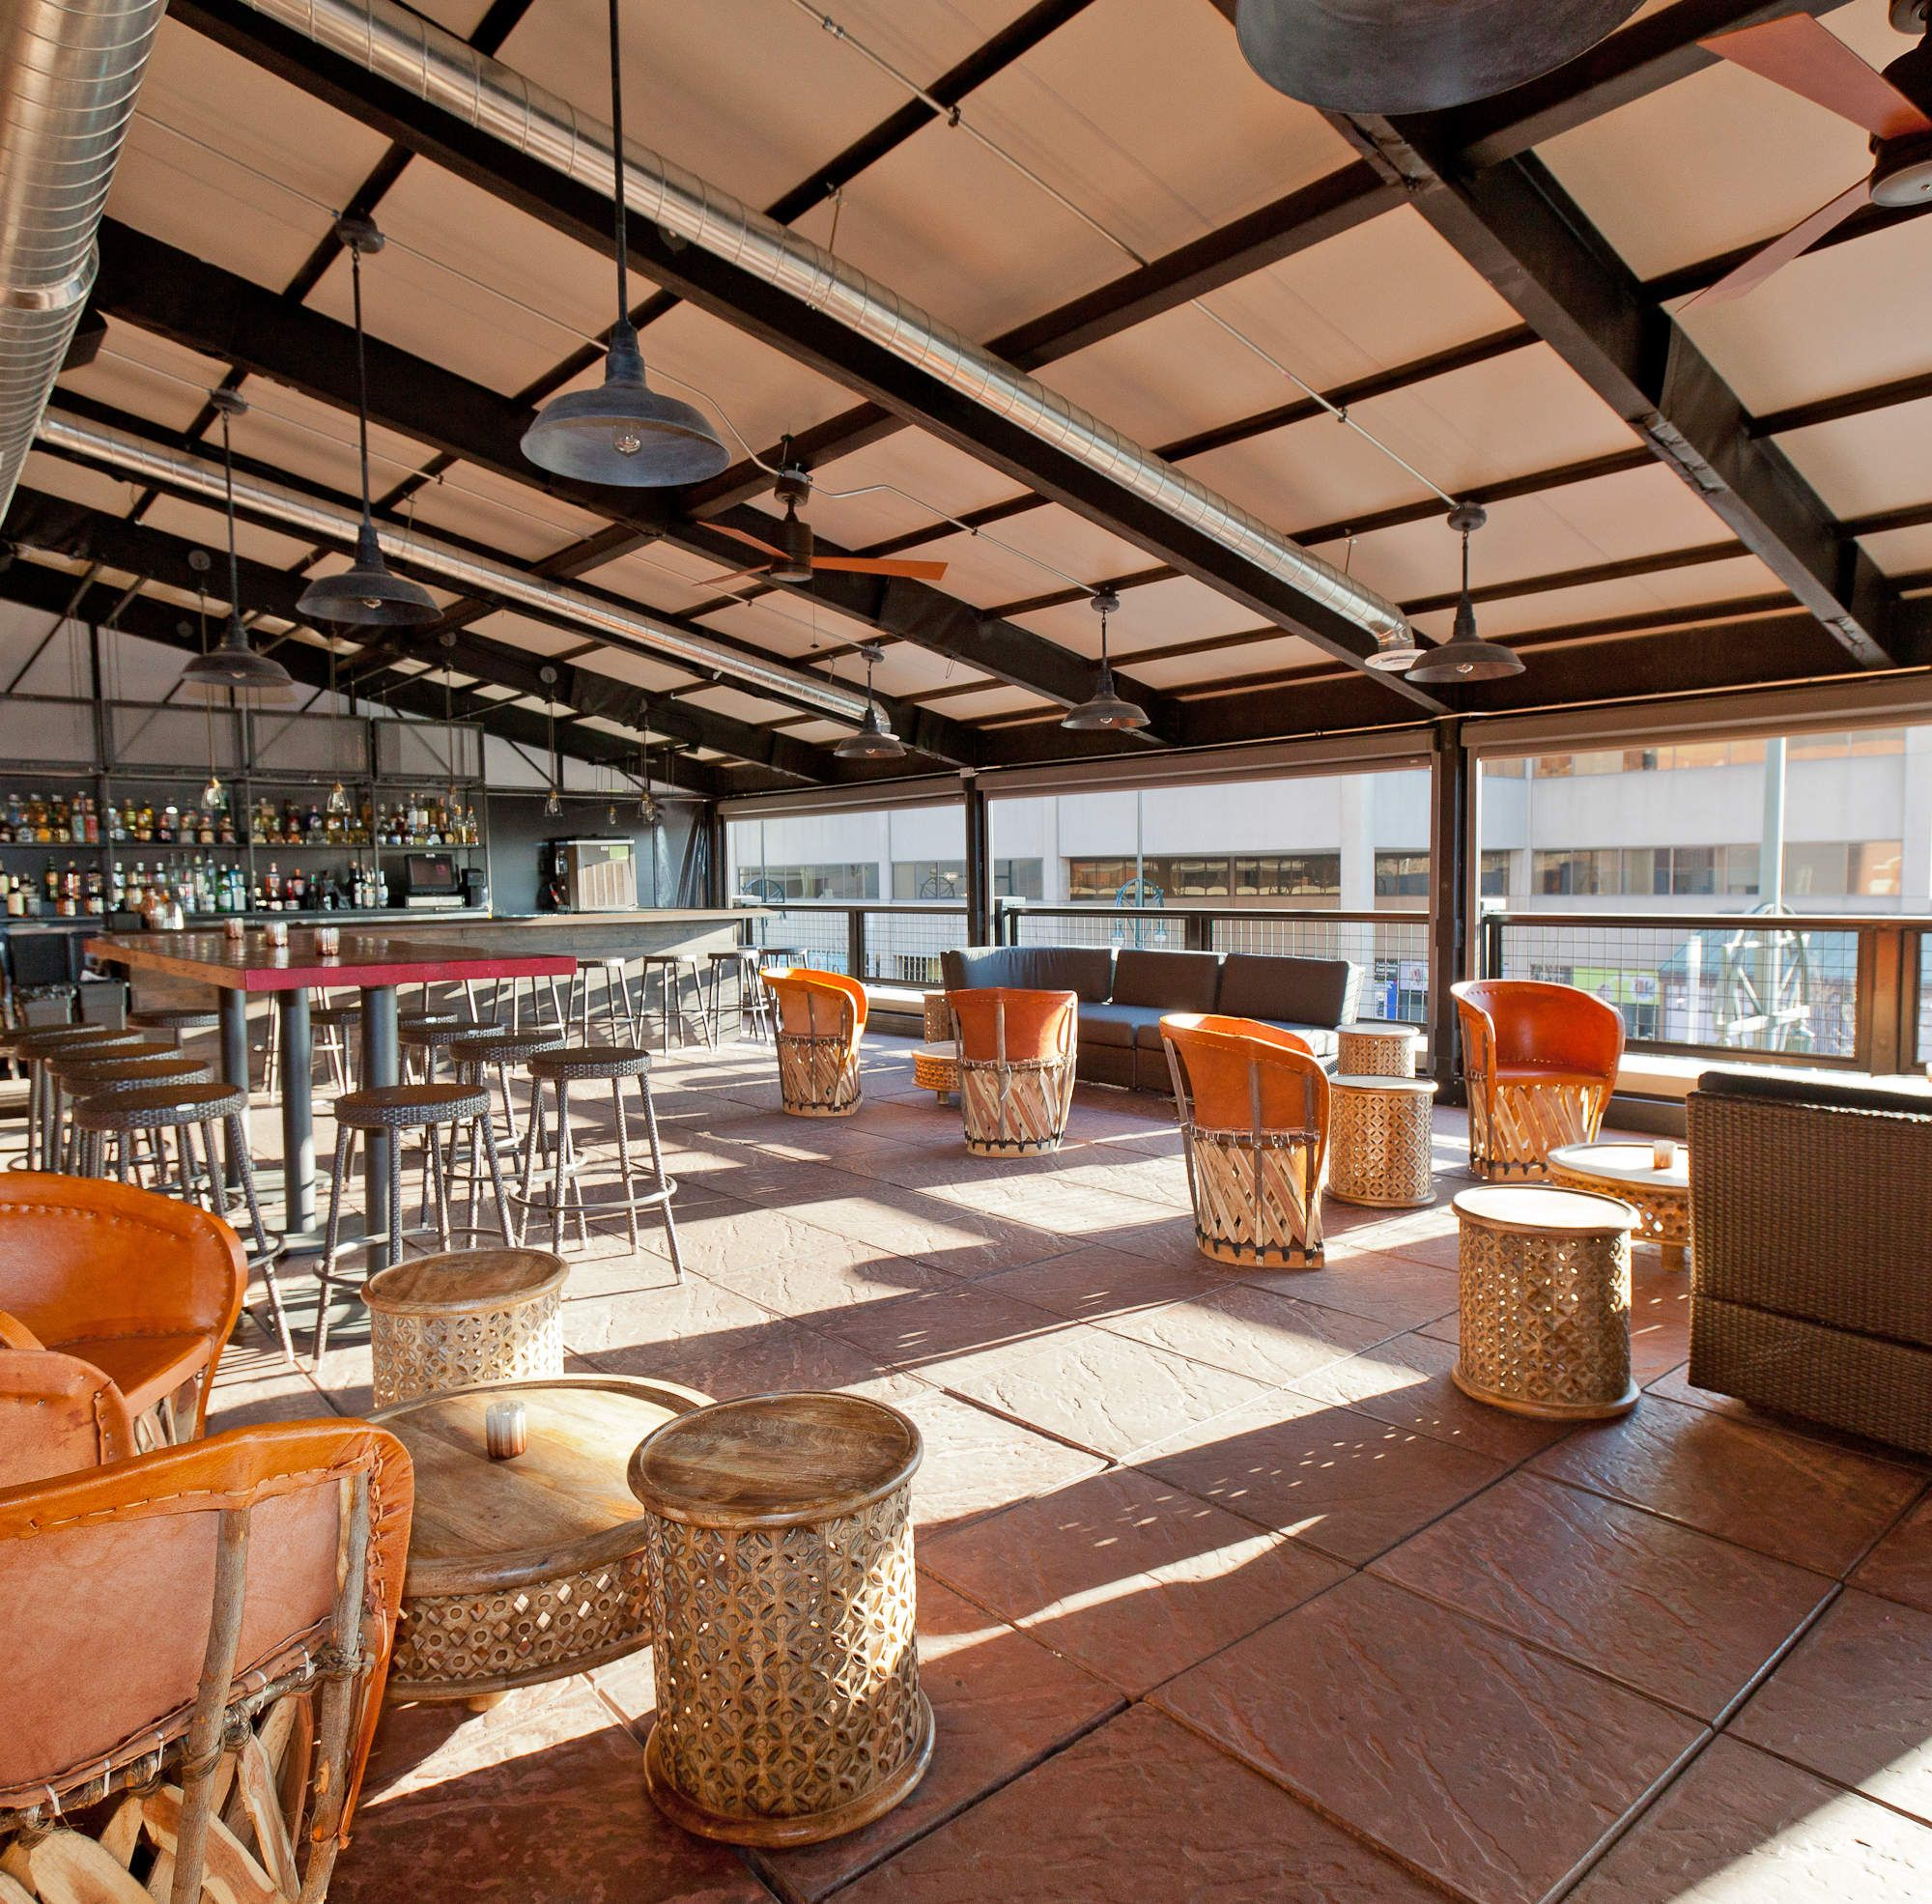 The Best Rooftop Bars in Denver | Best rooftop bars ...